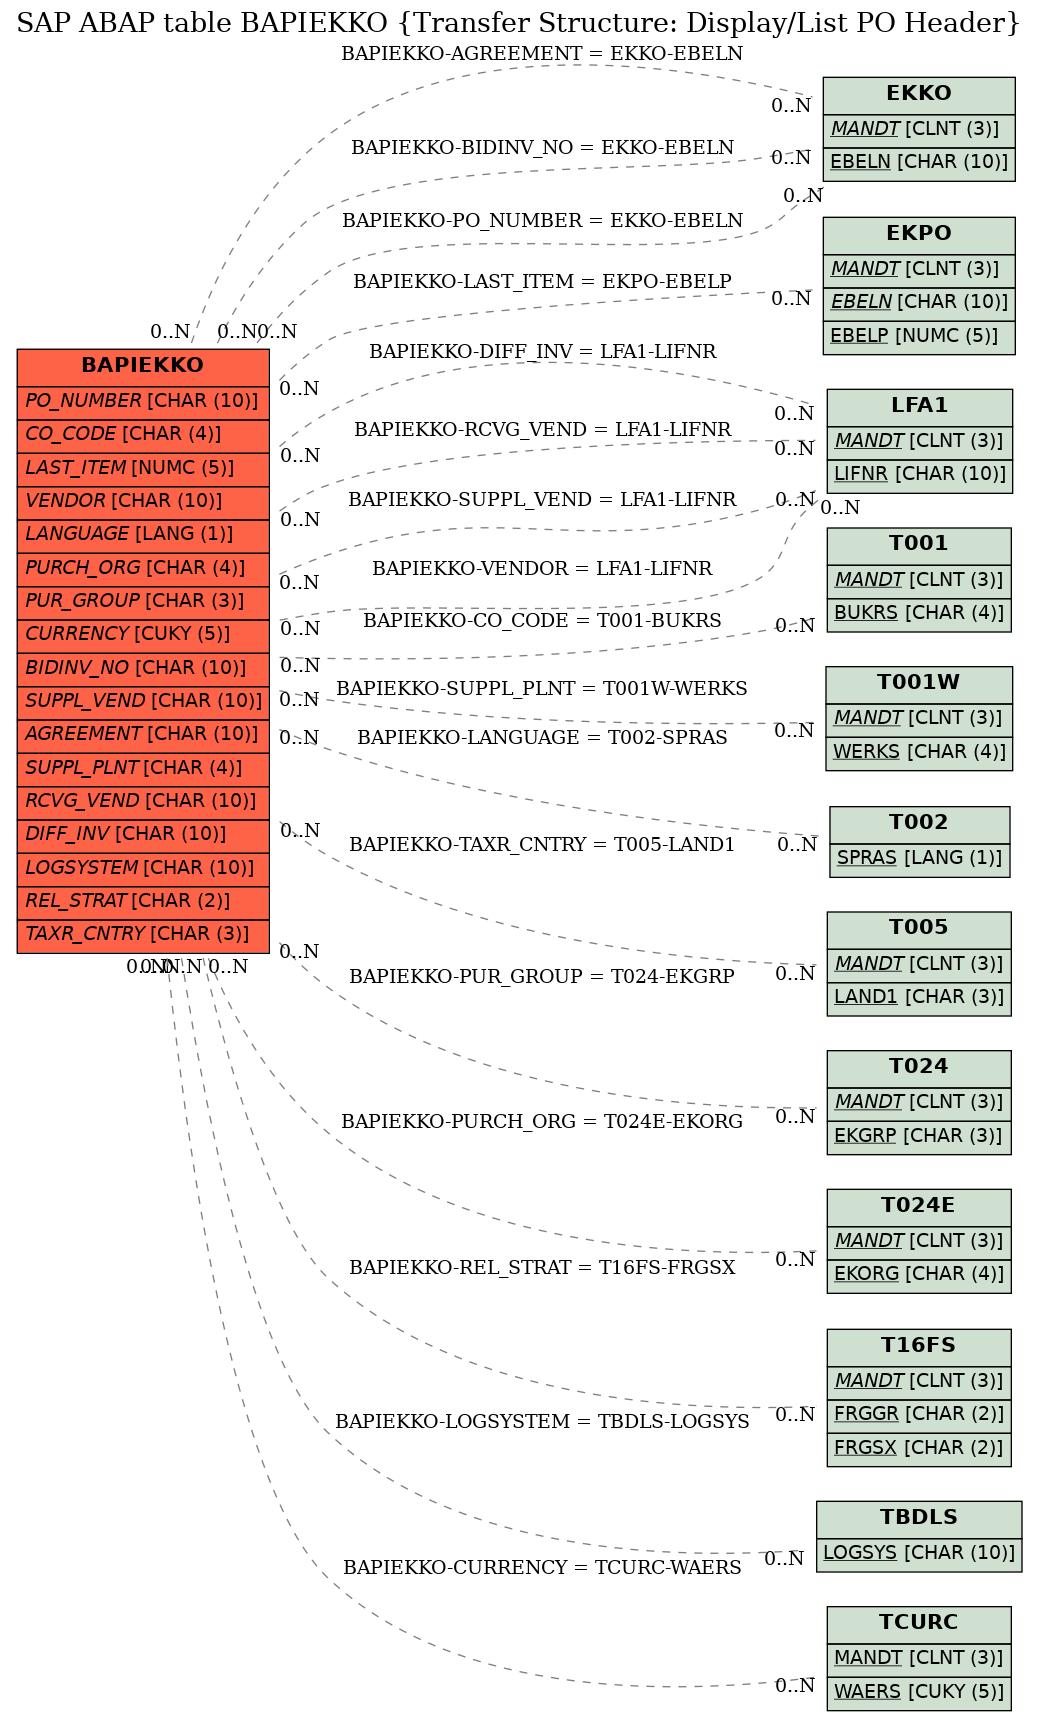 SAP ABAP Table BAPIEKKO (Transfer Structure: Display/List PO